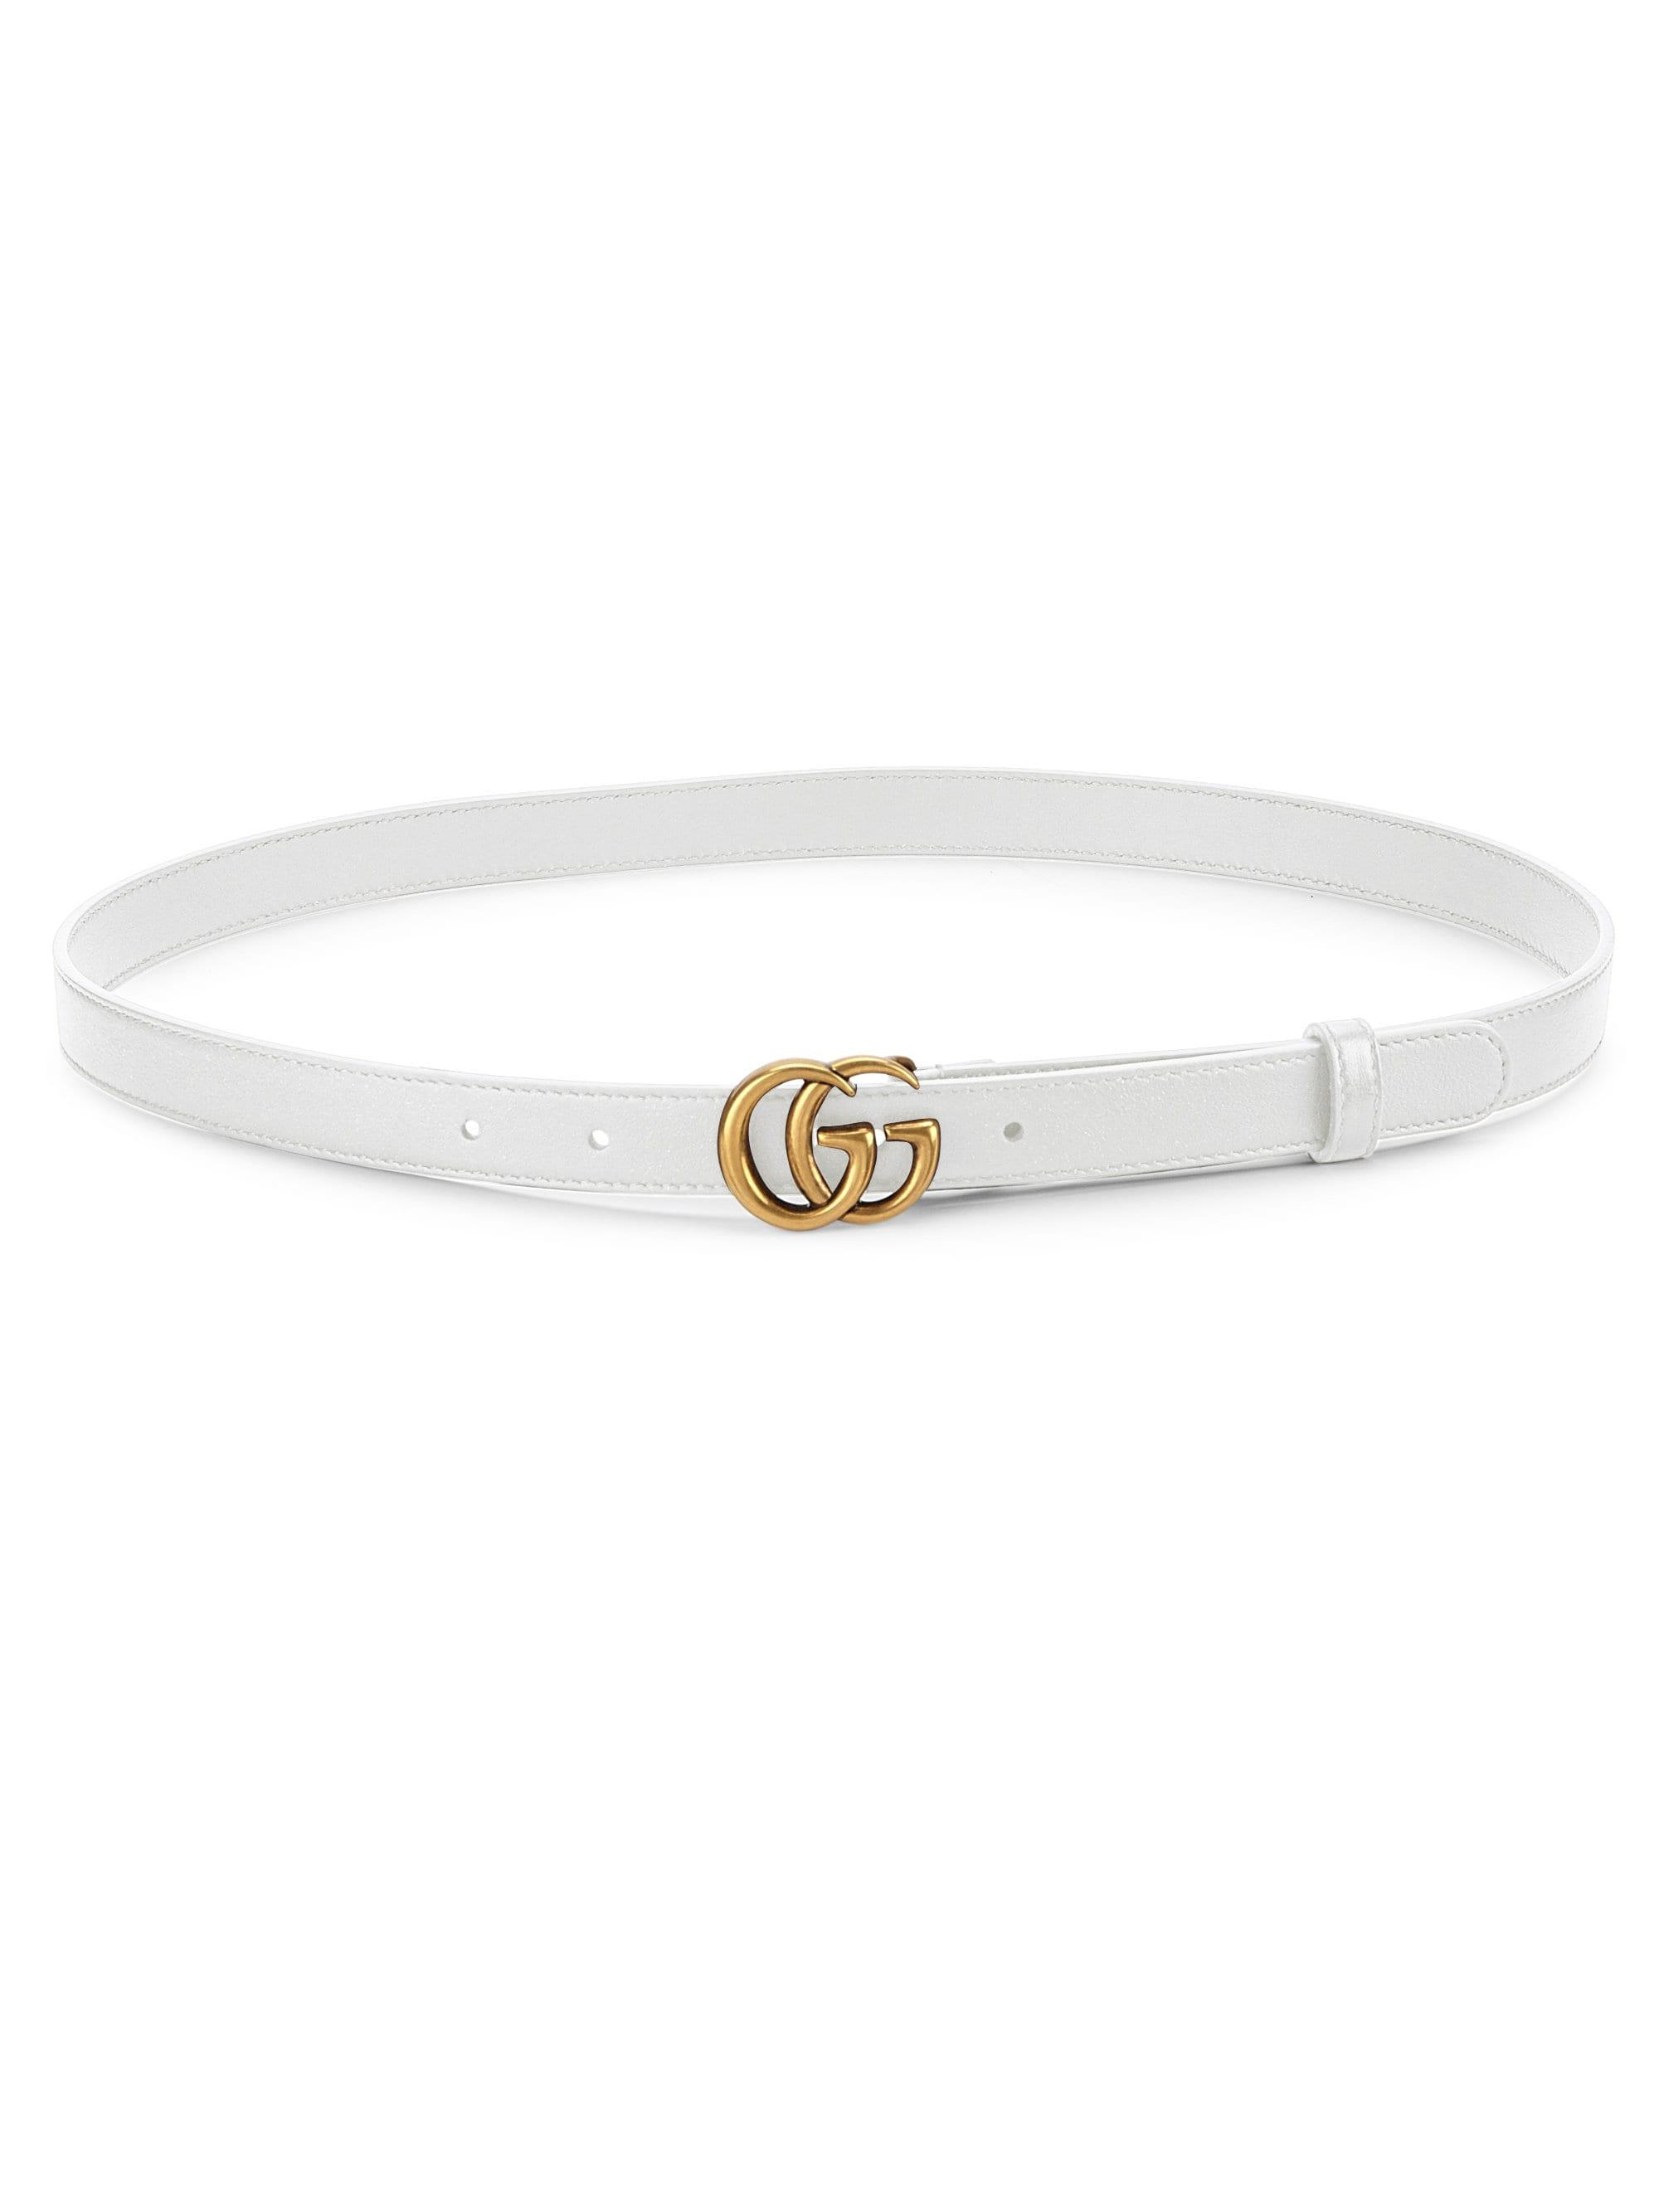 5121de3ca Gucci Women's Marmont Leather Logo Belt - Mystic White in White - Lyst